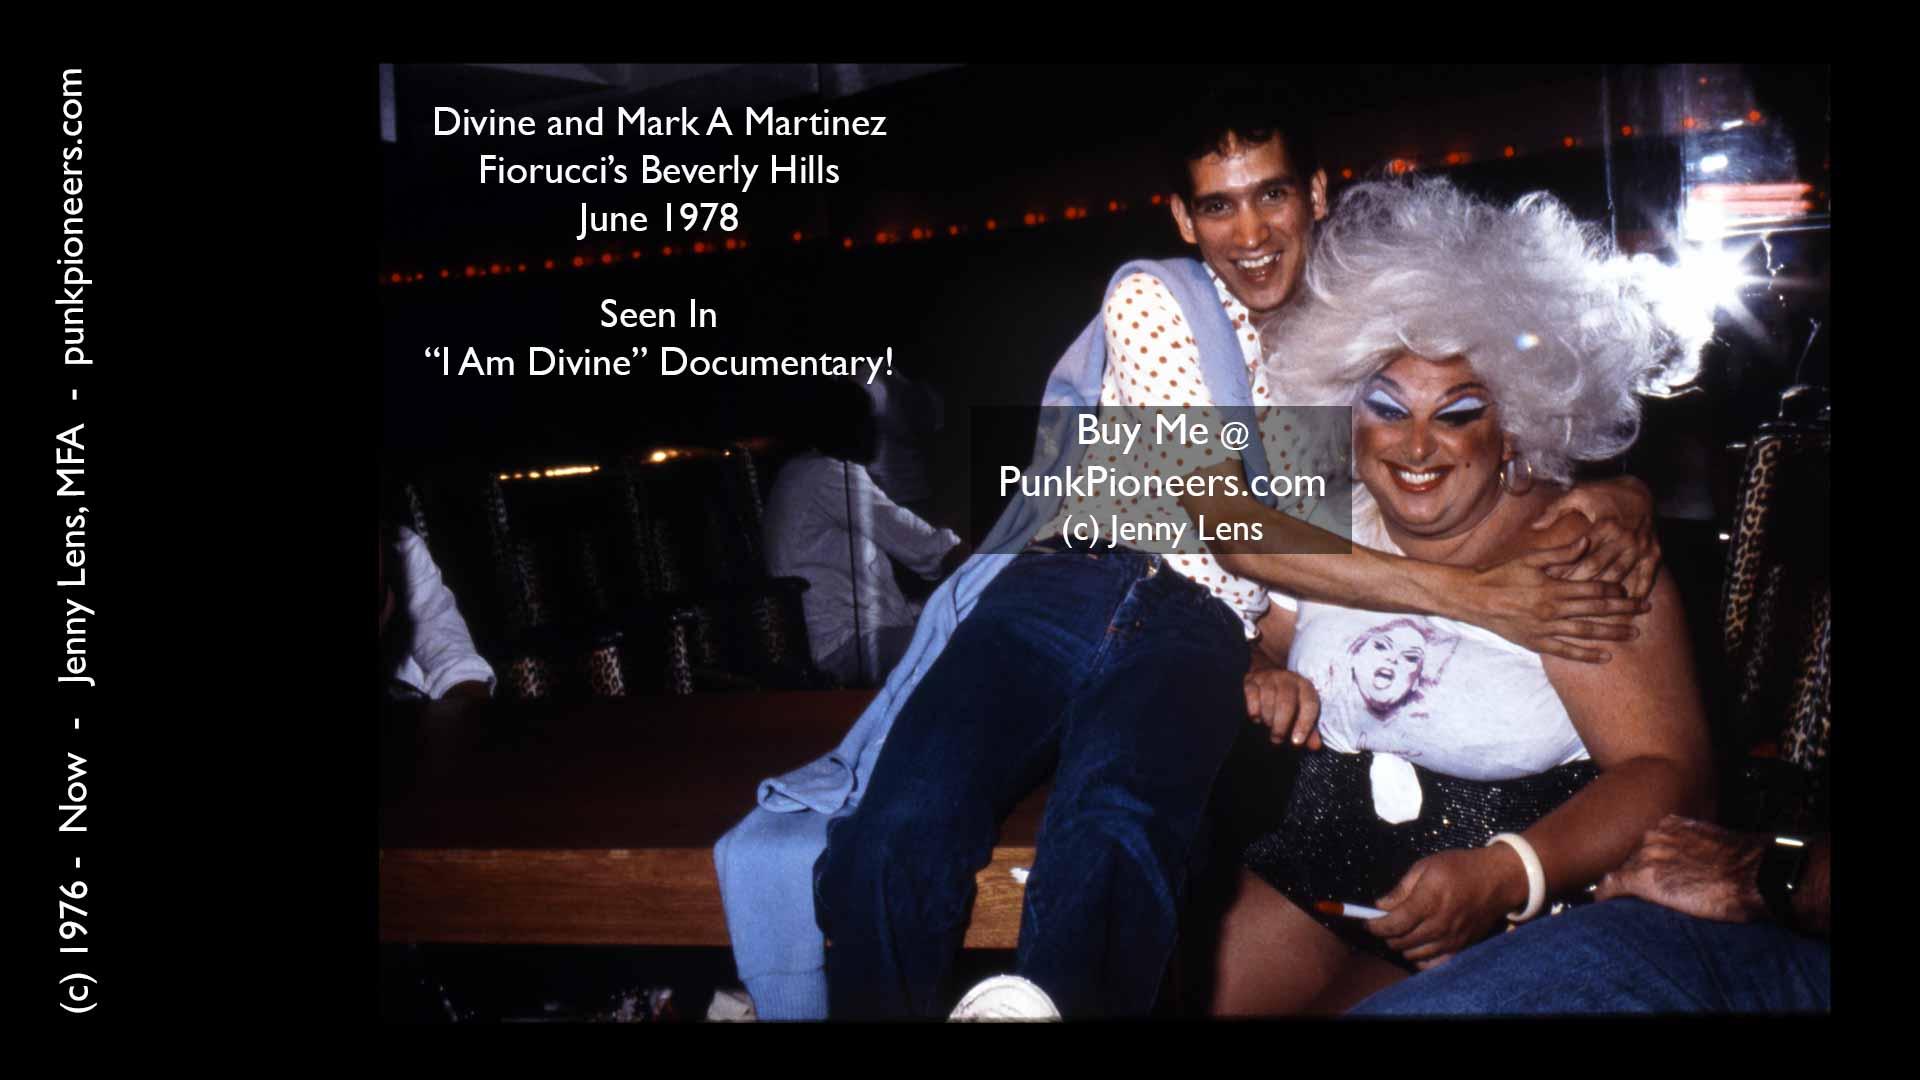 Divine and Mark A Martinez, Fiorucci Beverly Hills, June 1978, Jenny Lens, PunkPioneers.com